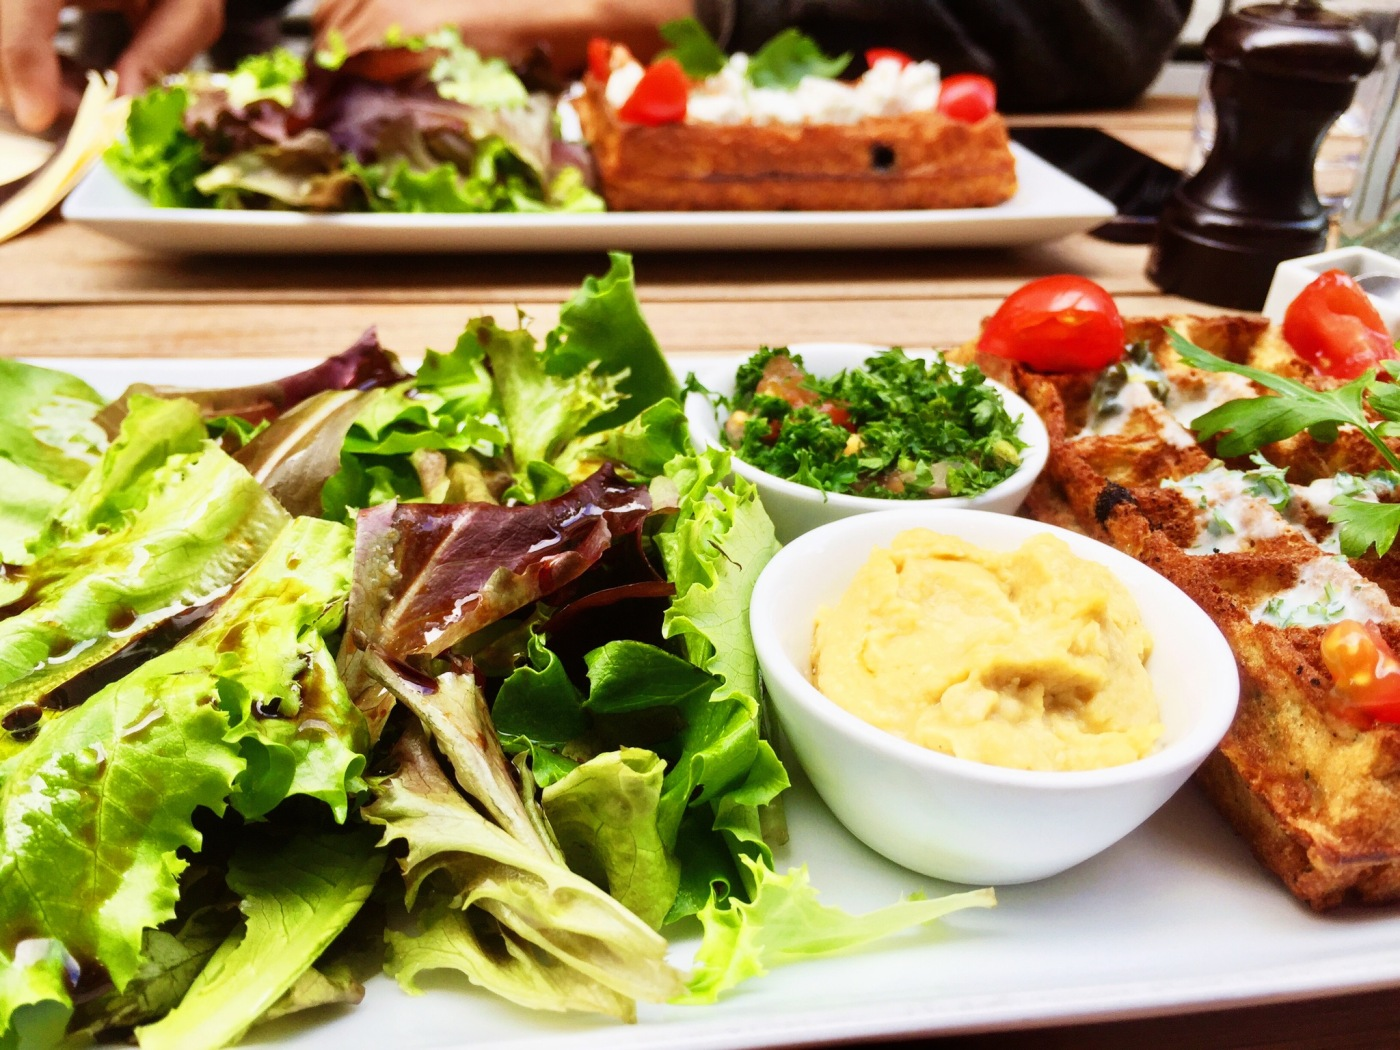 gaufrerie paris libanais houmous salade gaufre